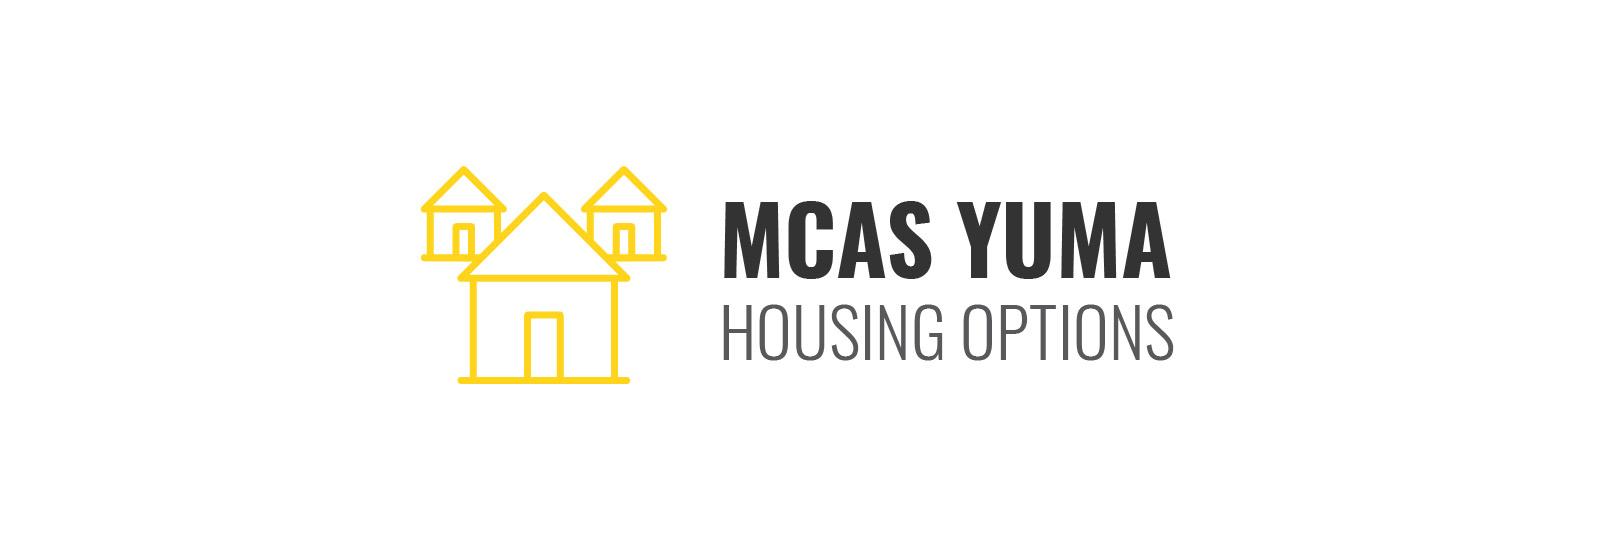 MCAS Yuma Housing Options